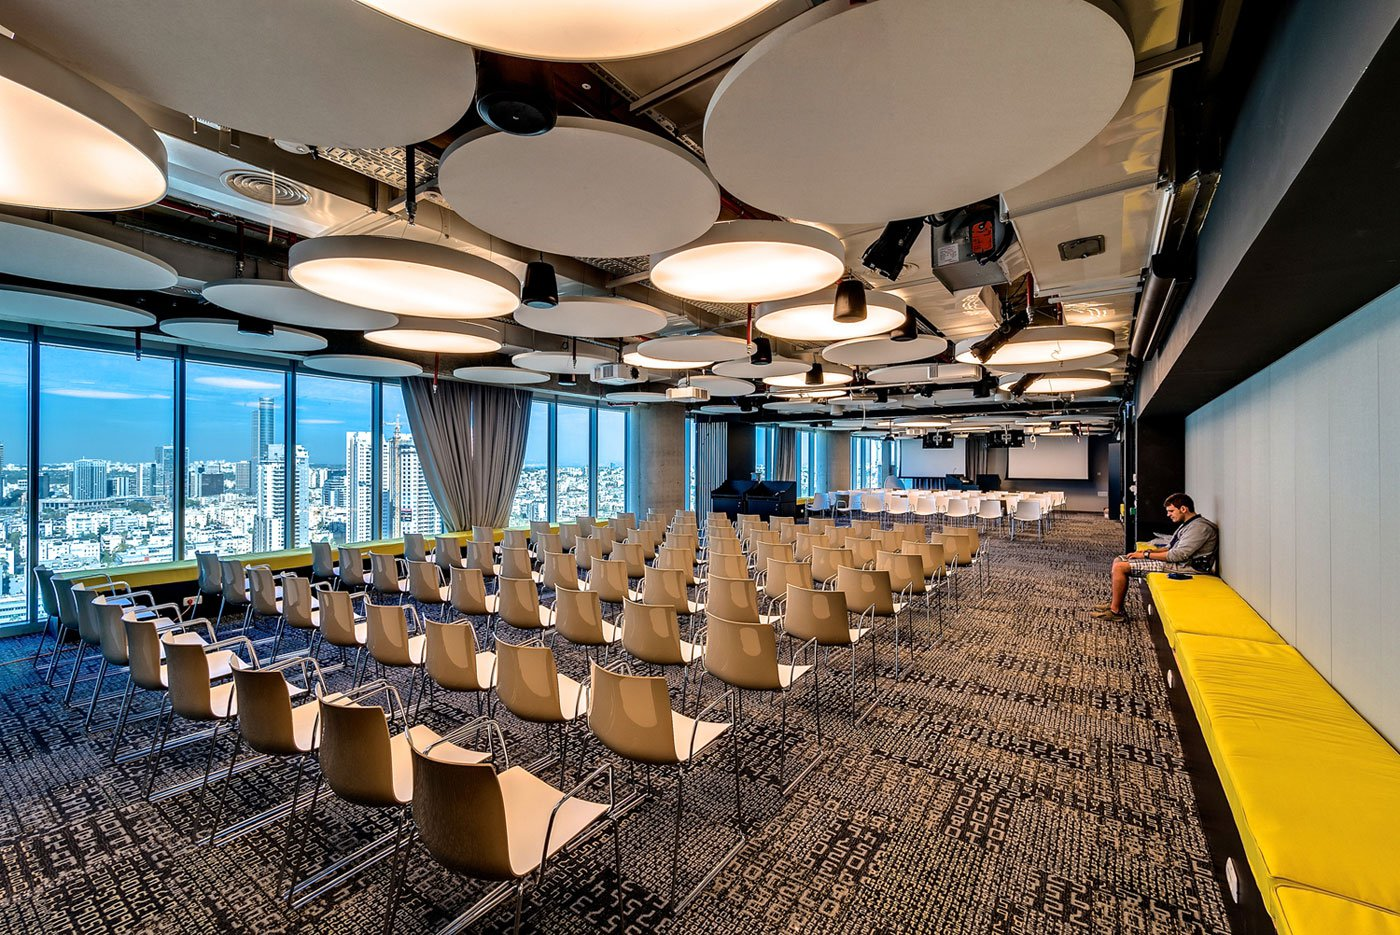 The Googles Office in Tel Aviv by Camenzind Evolution